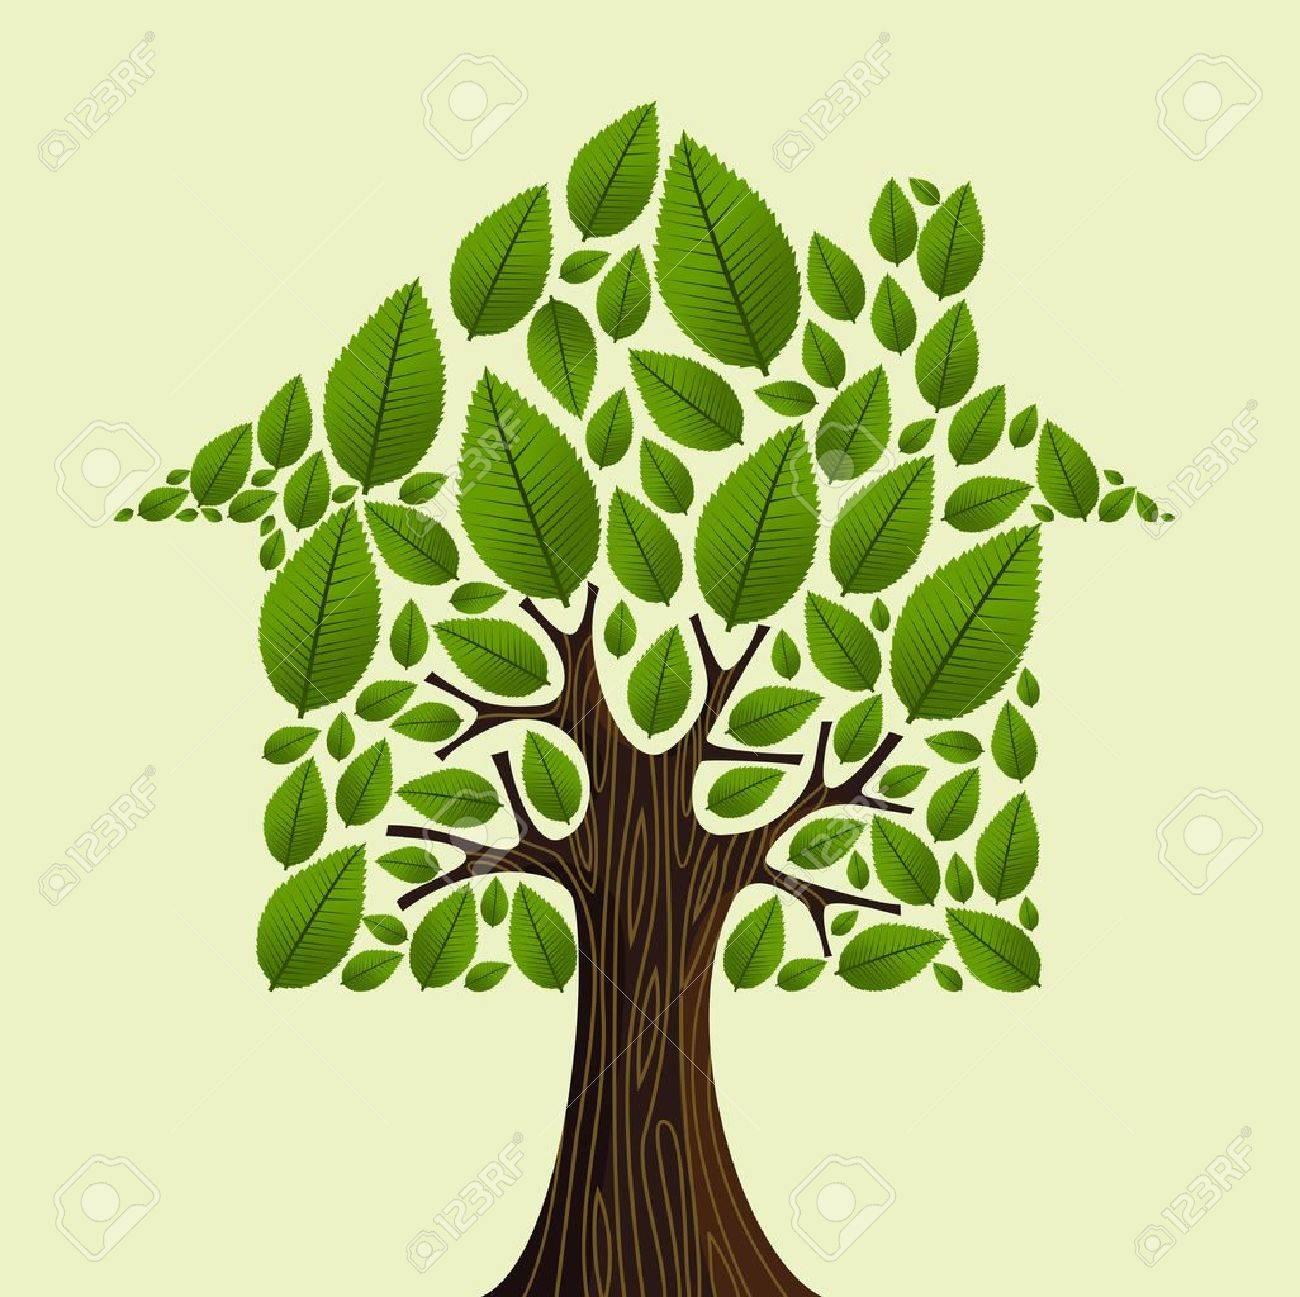 Real estate tree house green leaves illustration. Stock Vector - 21275410